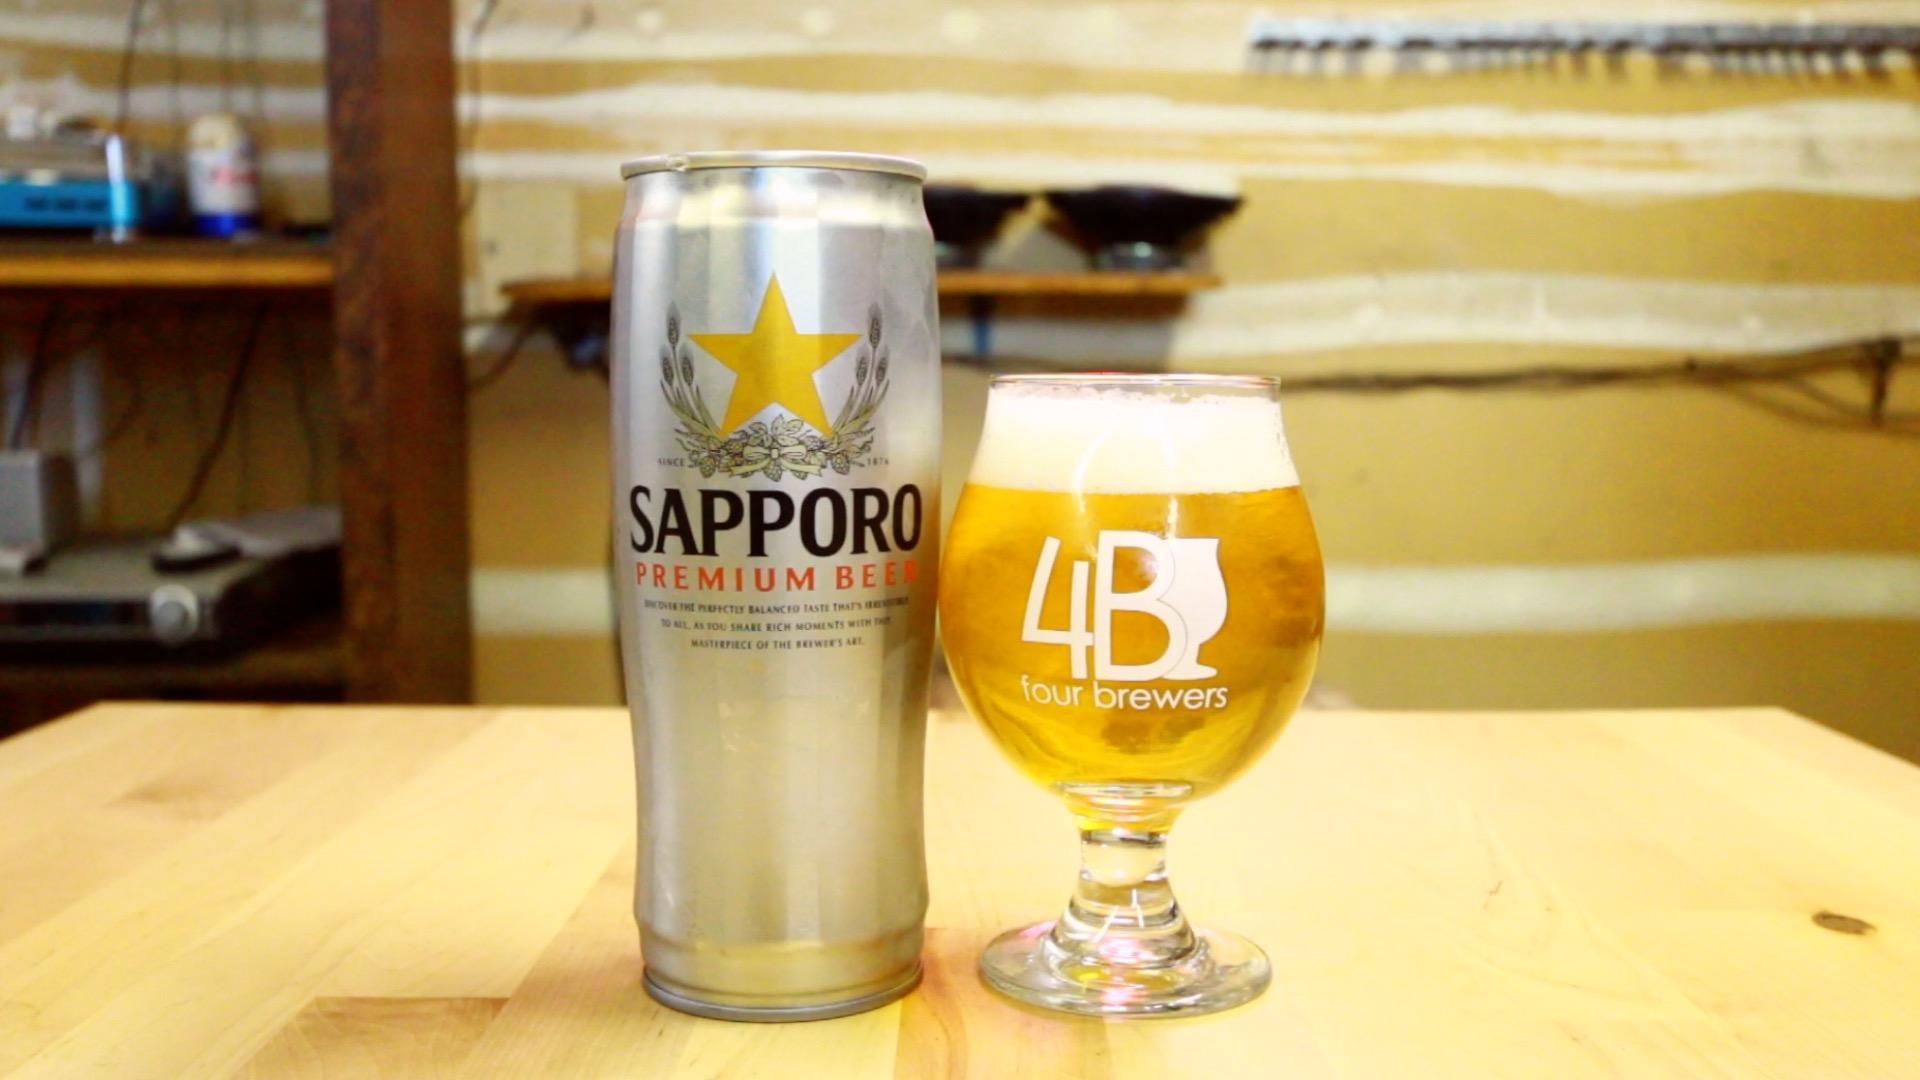 Sapporo Thumb.jpg